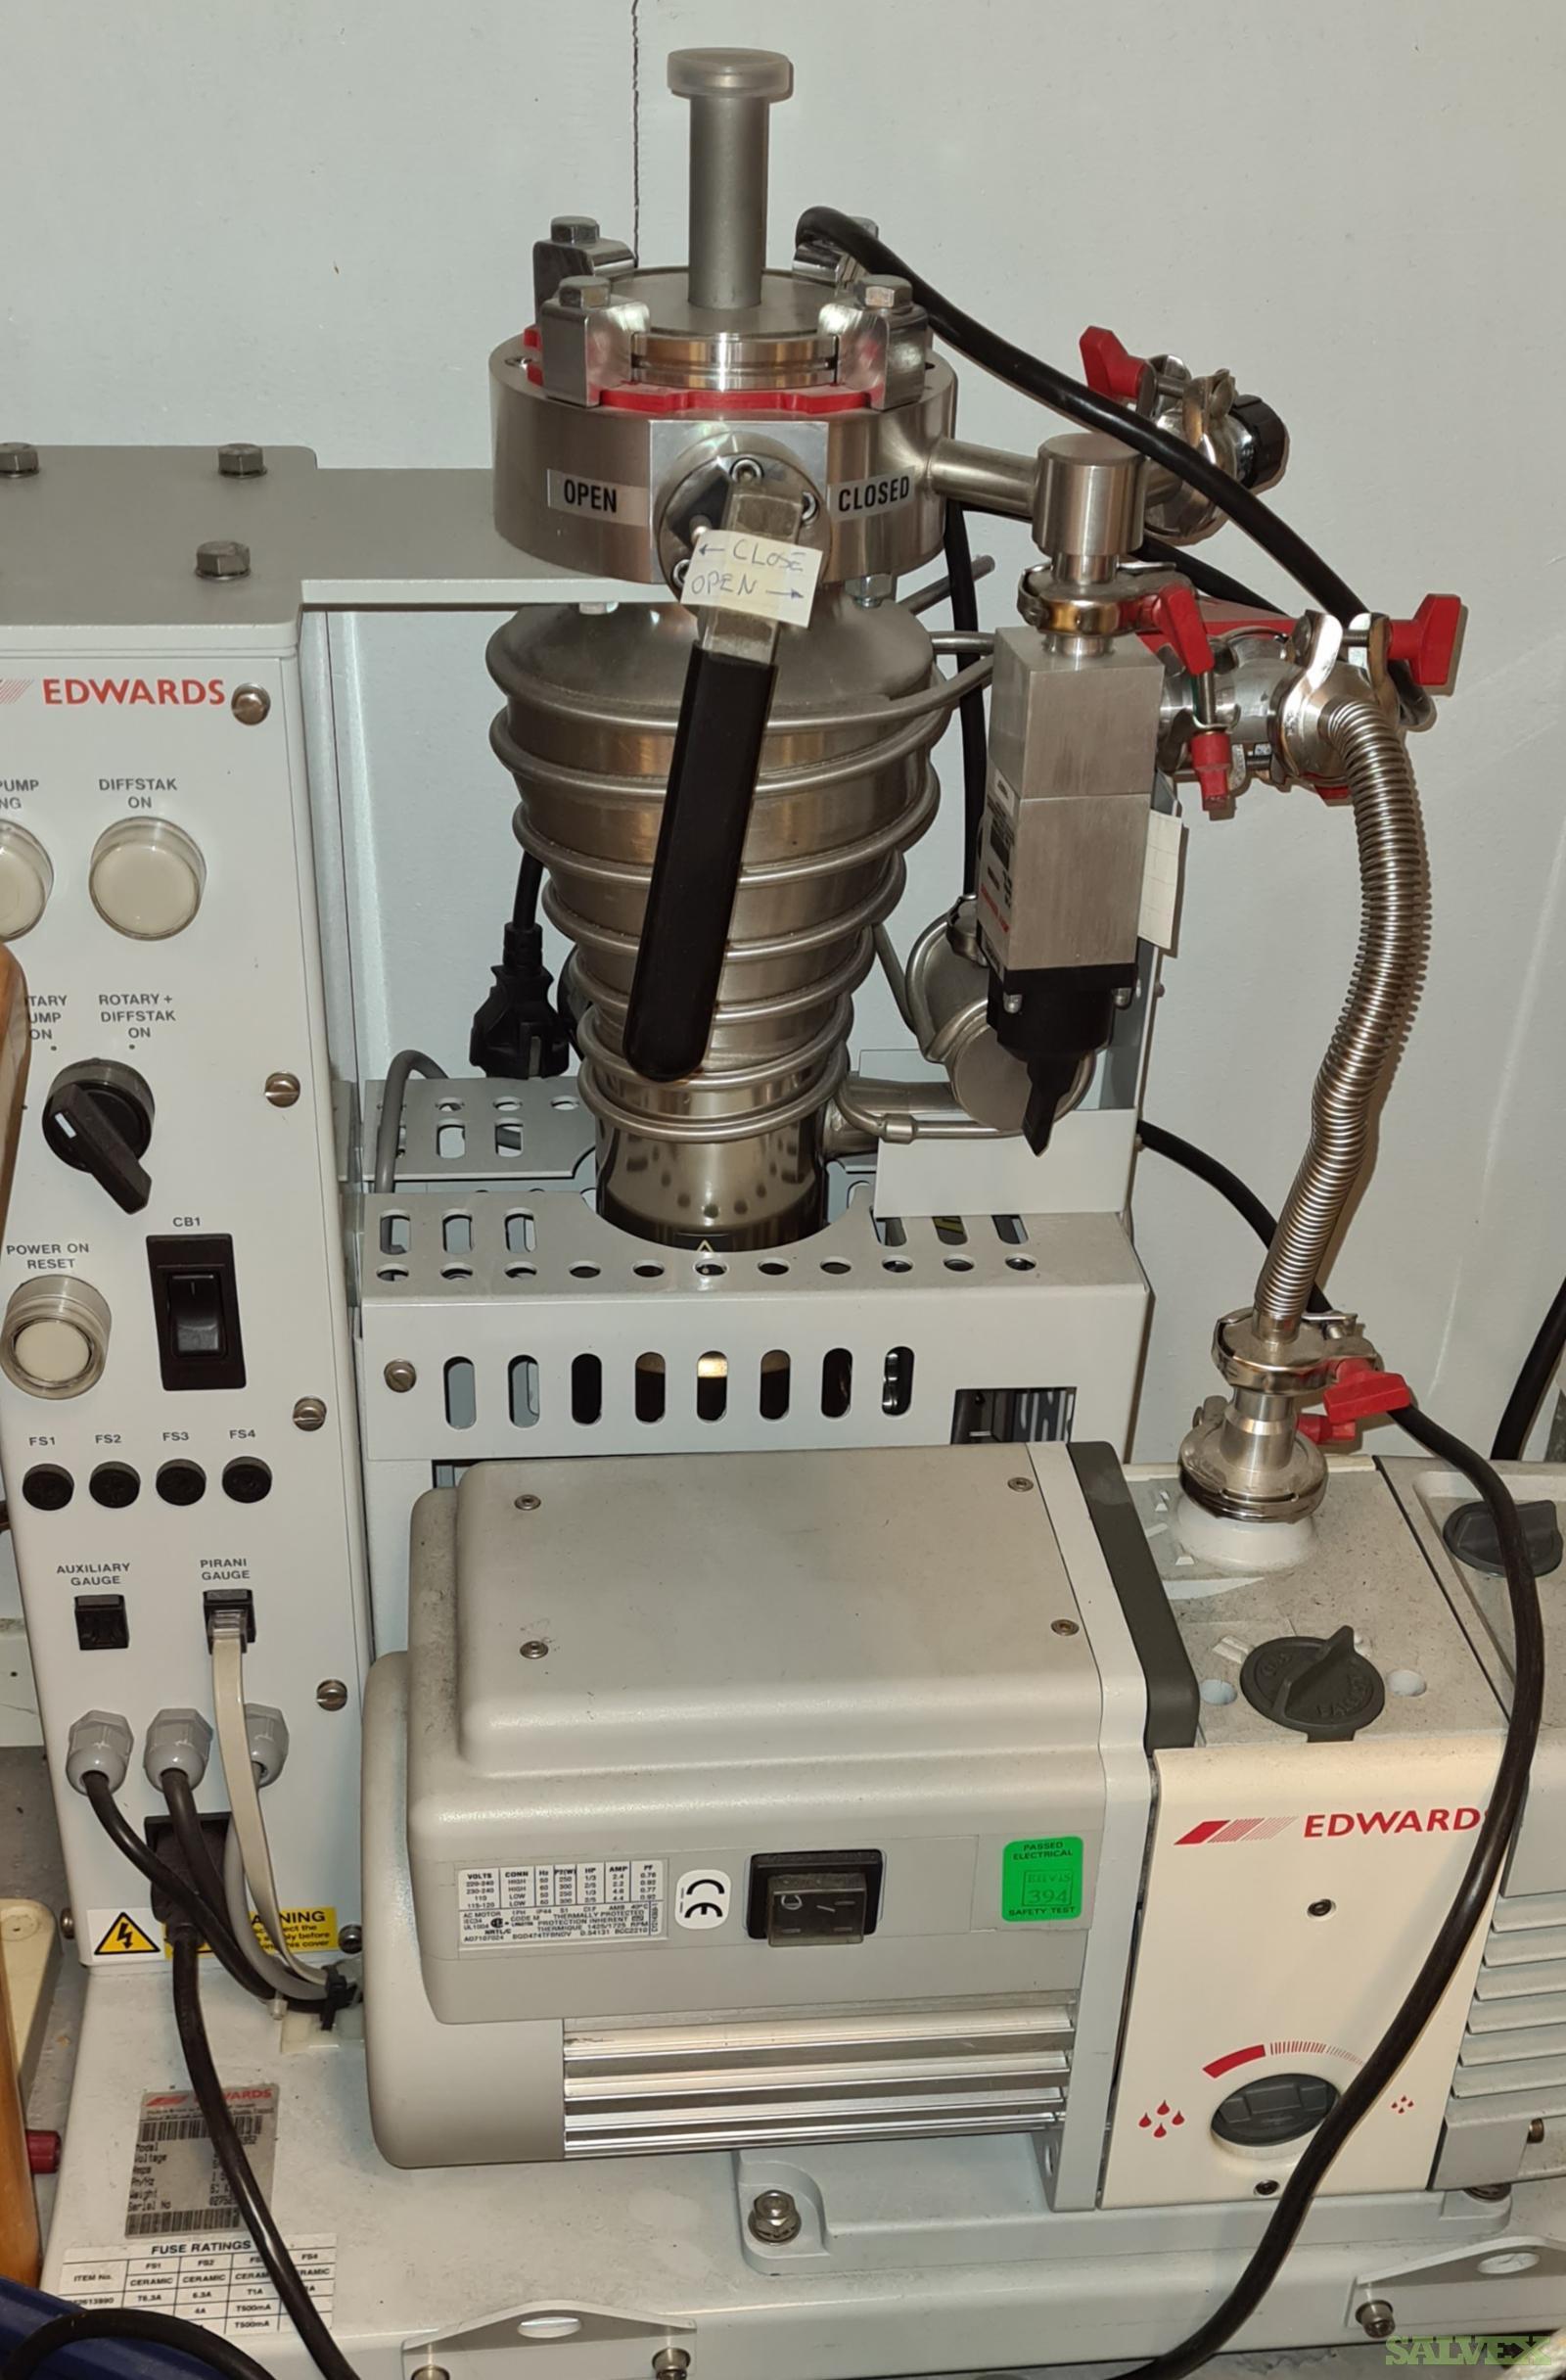 Lab Equipment: Magnetic Stirrer, Cryo Flasks, Pharmacia Column, Bottles, Phase Separators, and More (347 Items)